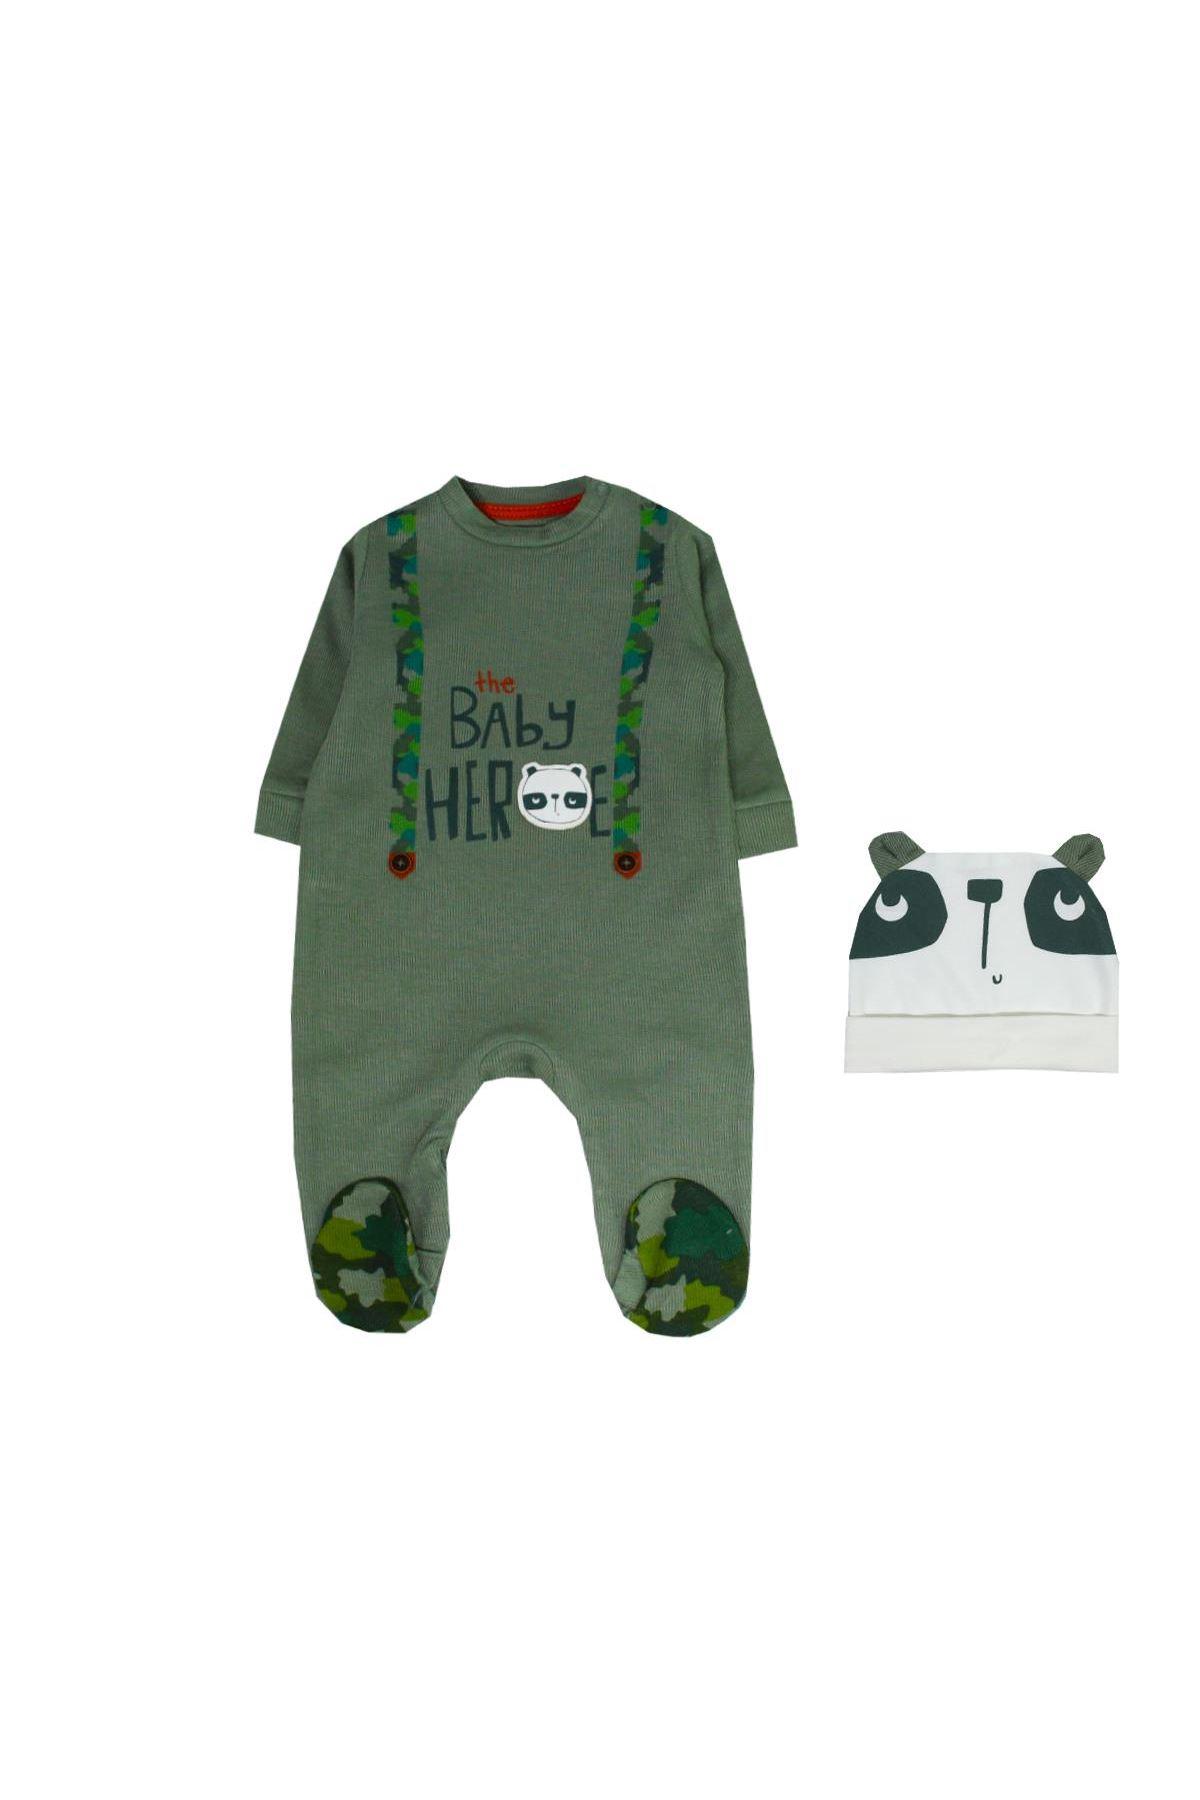 Tongs Baby Bebe Tulum 2680 Yeşil